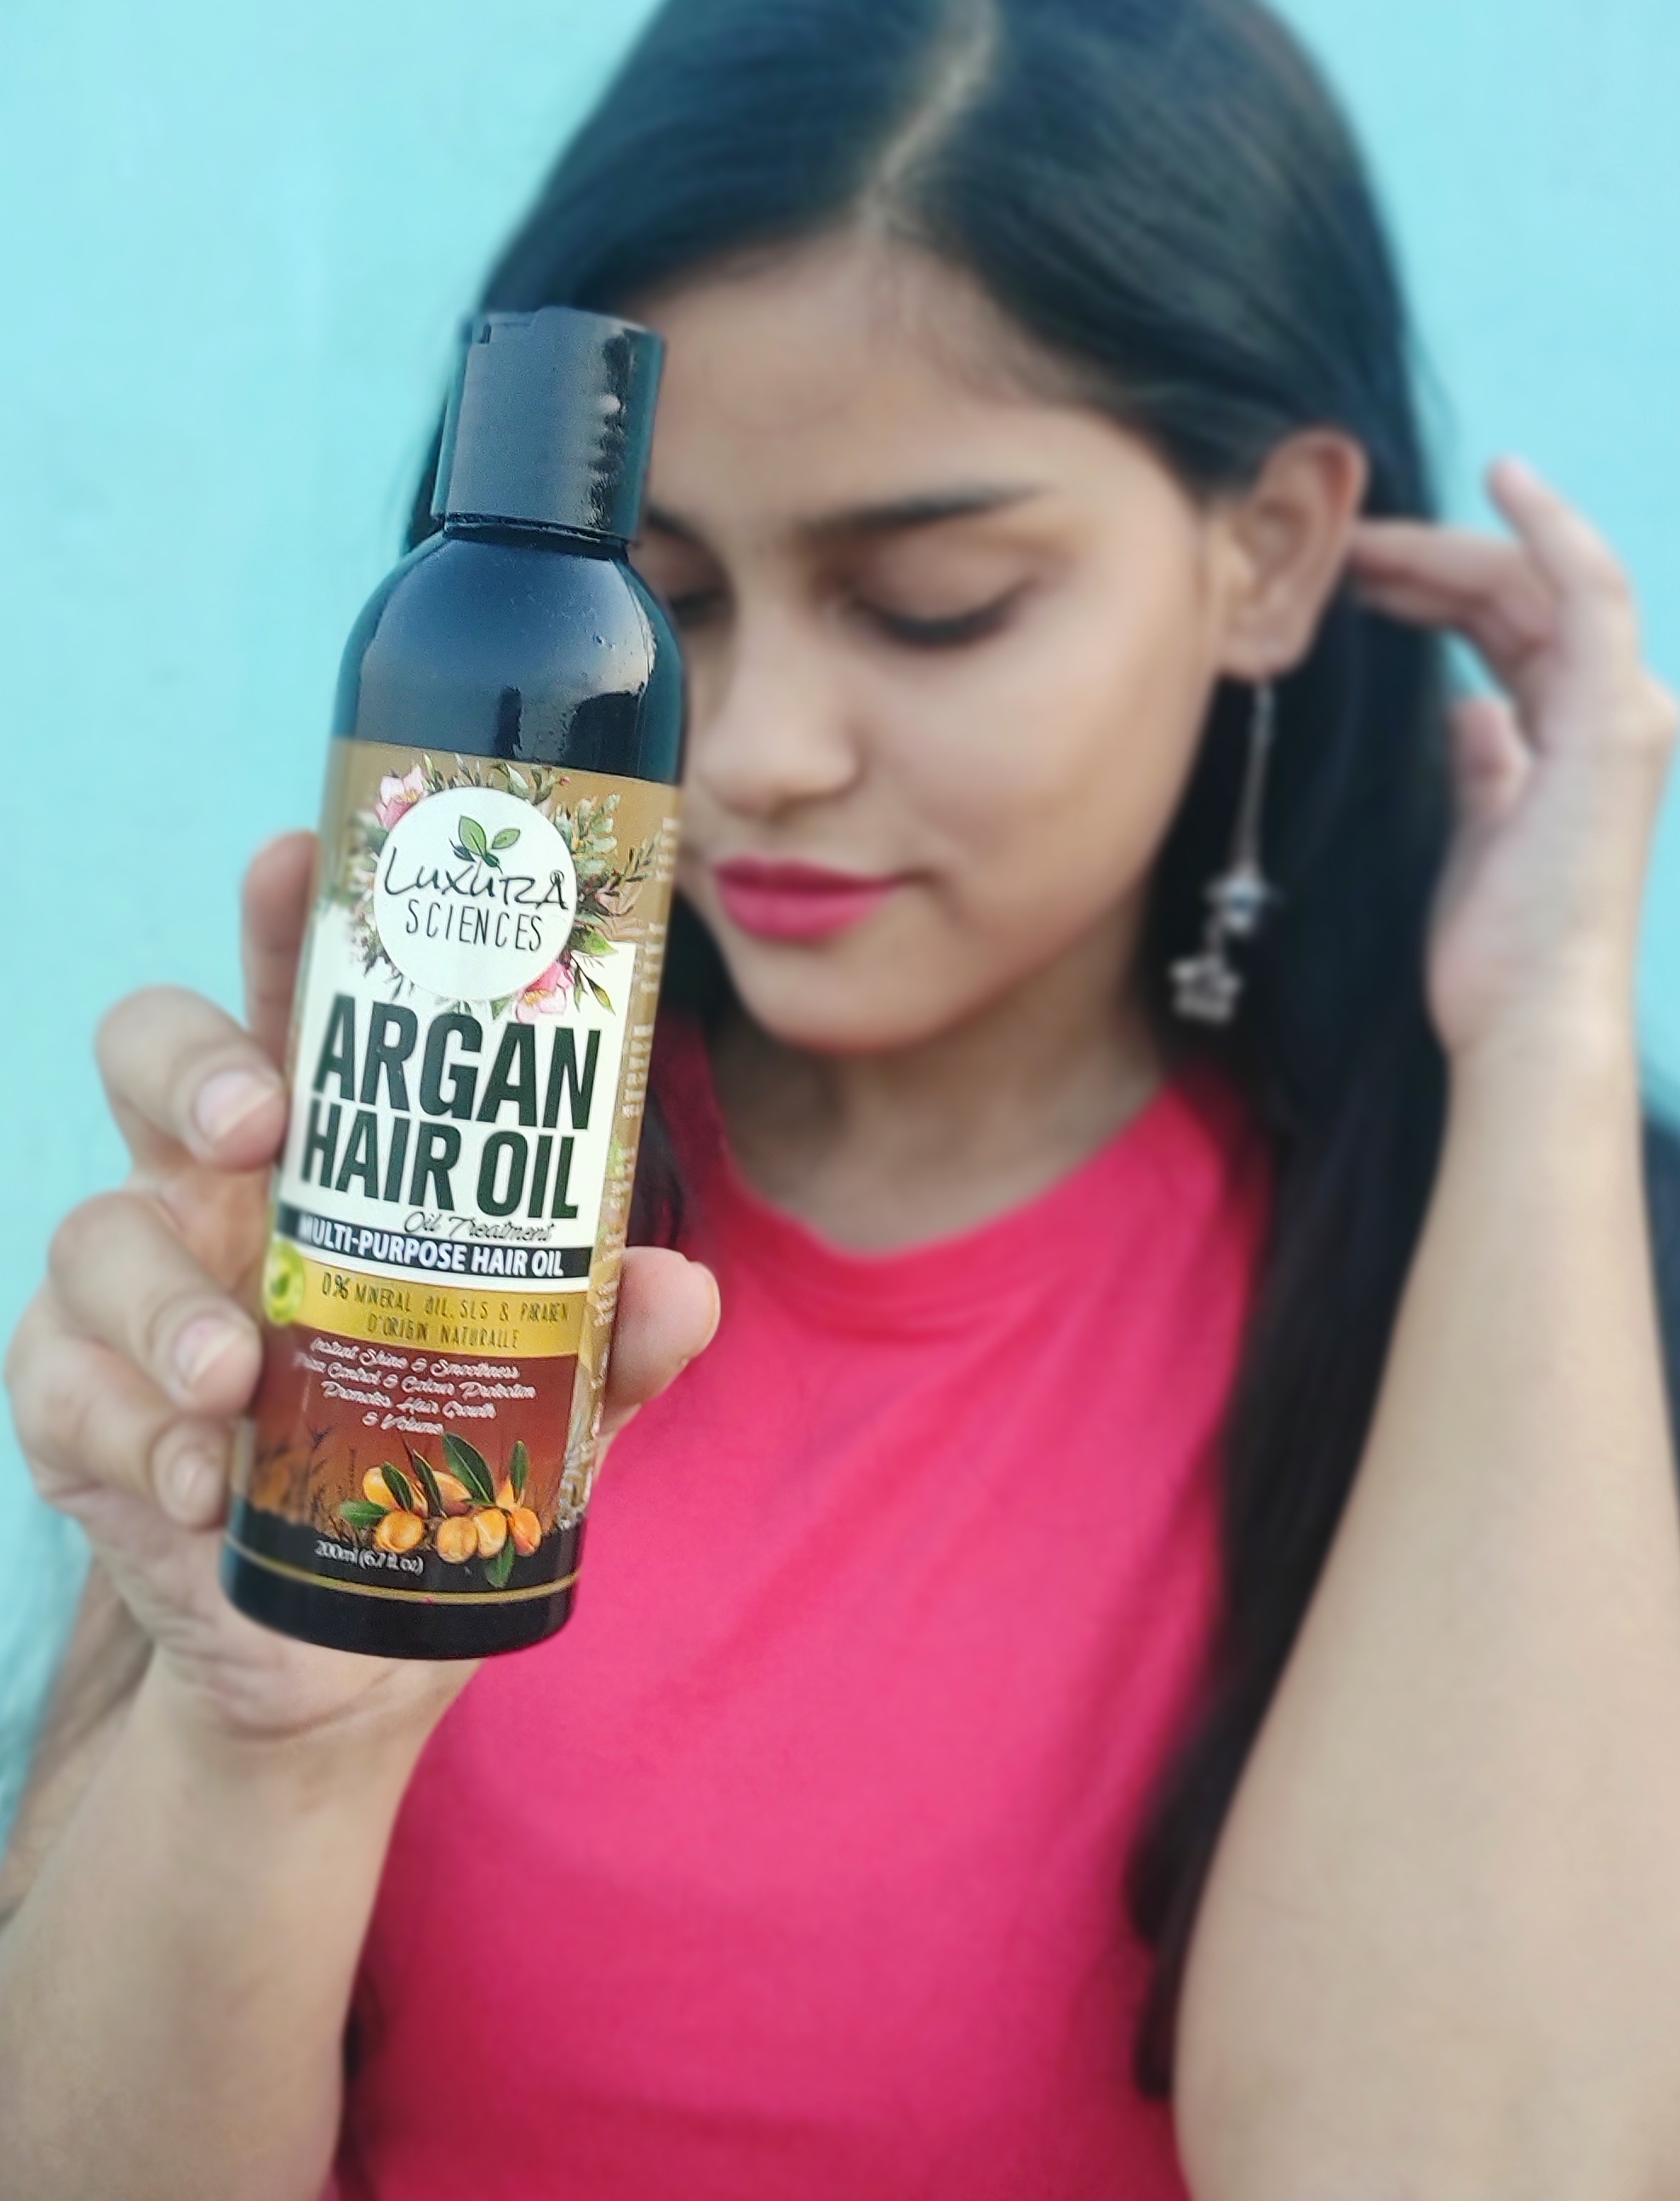 Luxura Sciences Argan Hair Oil 200 ml-Absolutely Loving-By shireenjamil-1